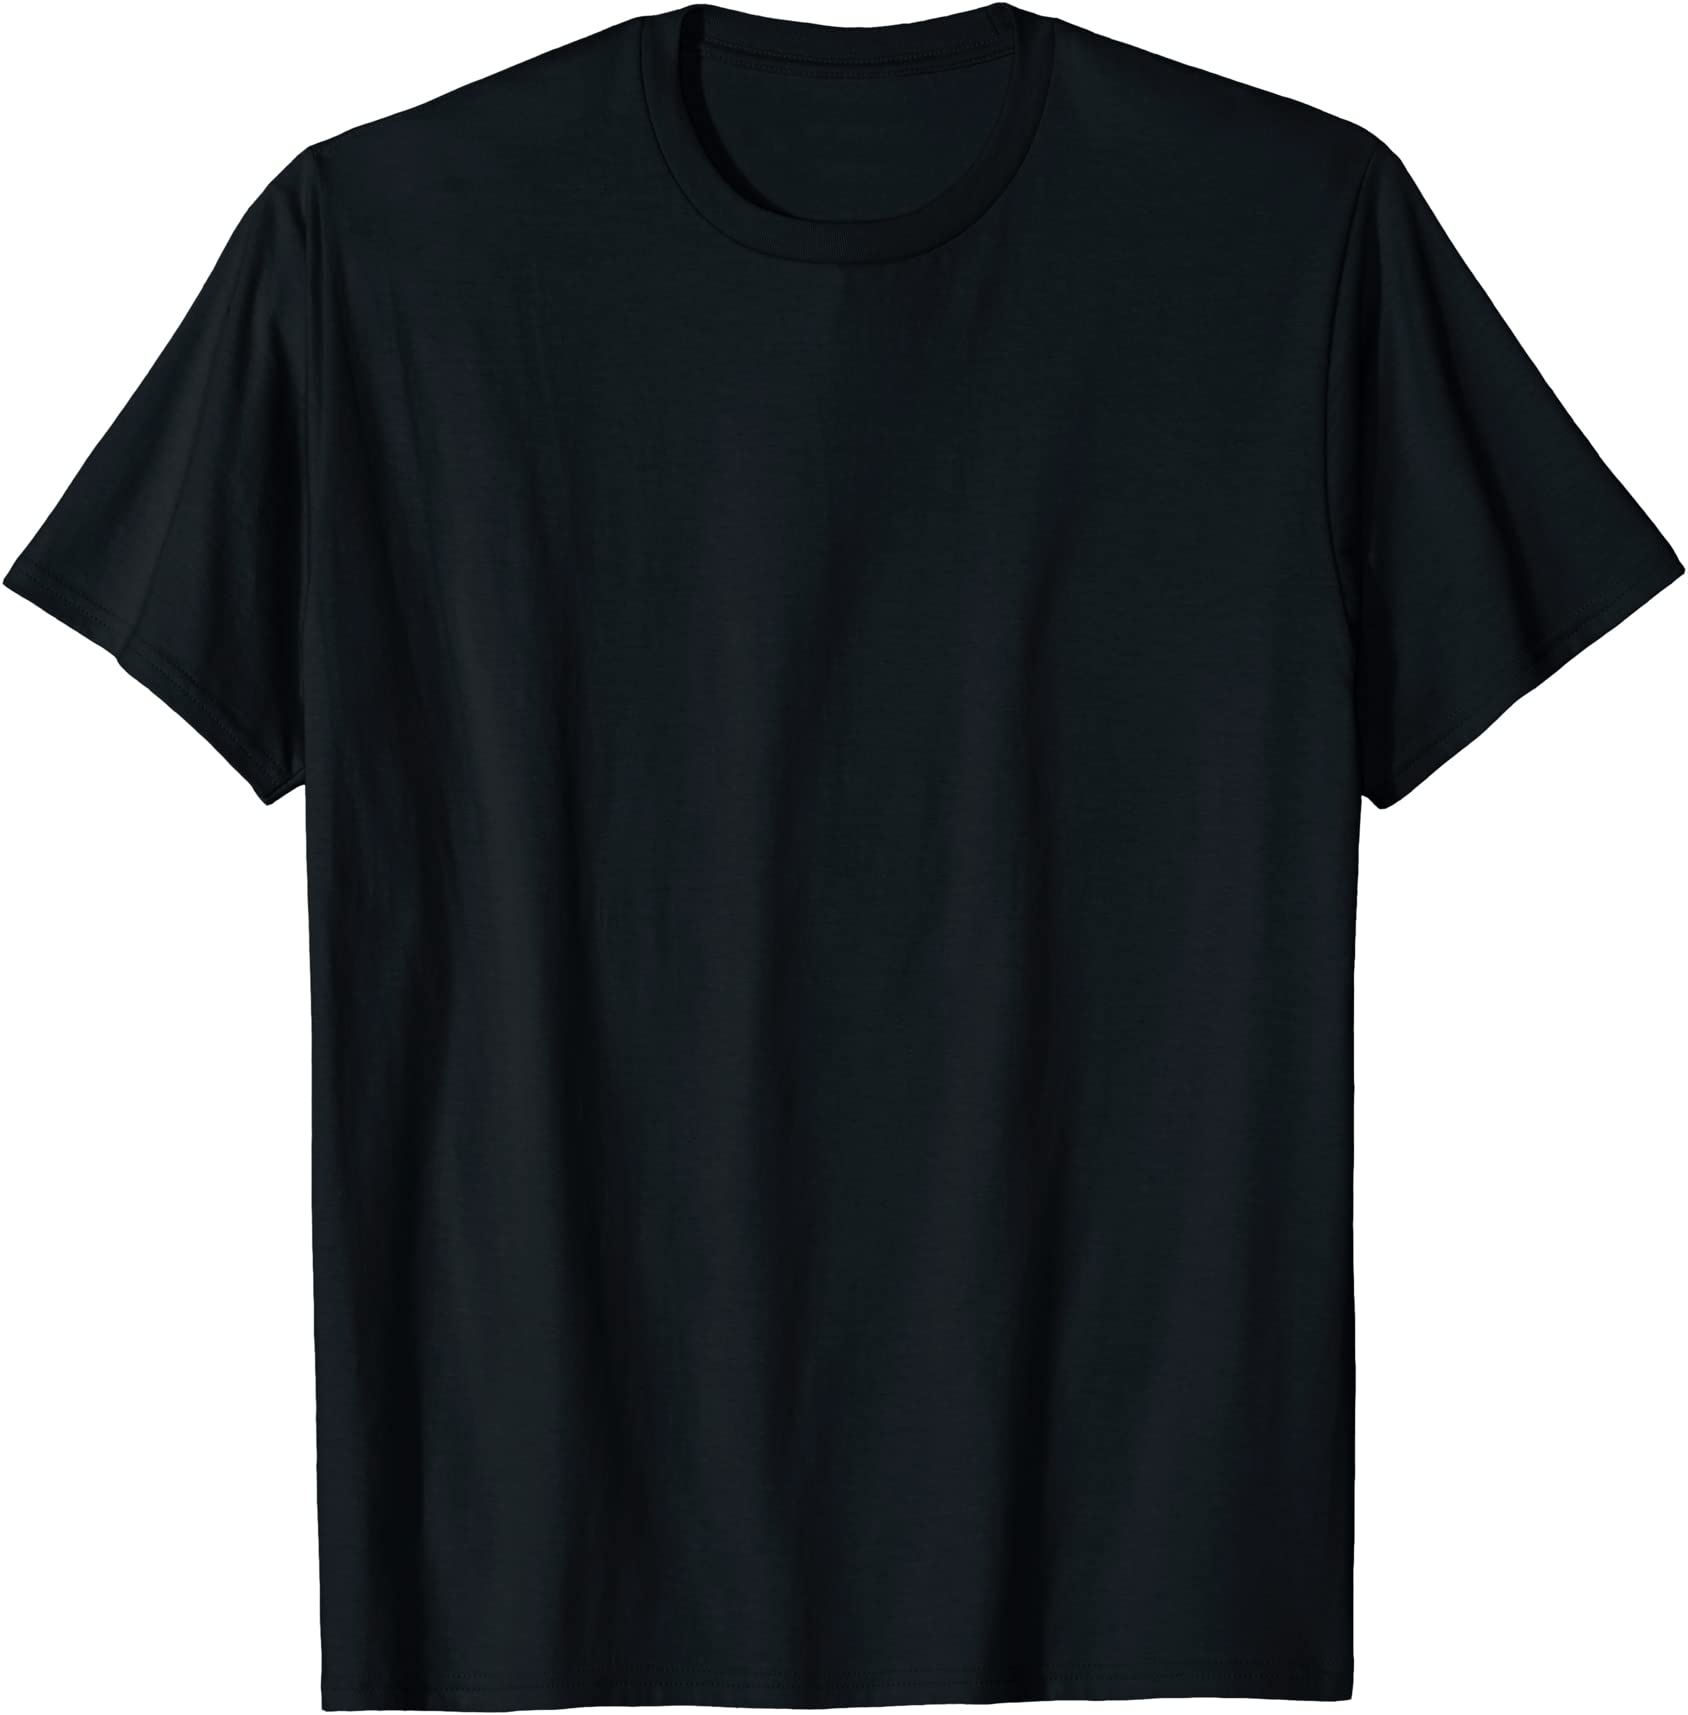 Clothing Tee Shirt Im A Occupational Therapist Shirt